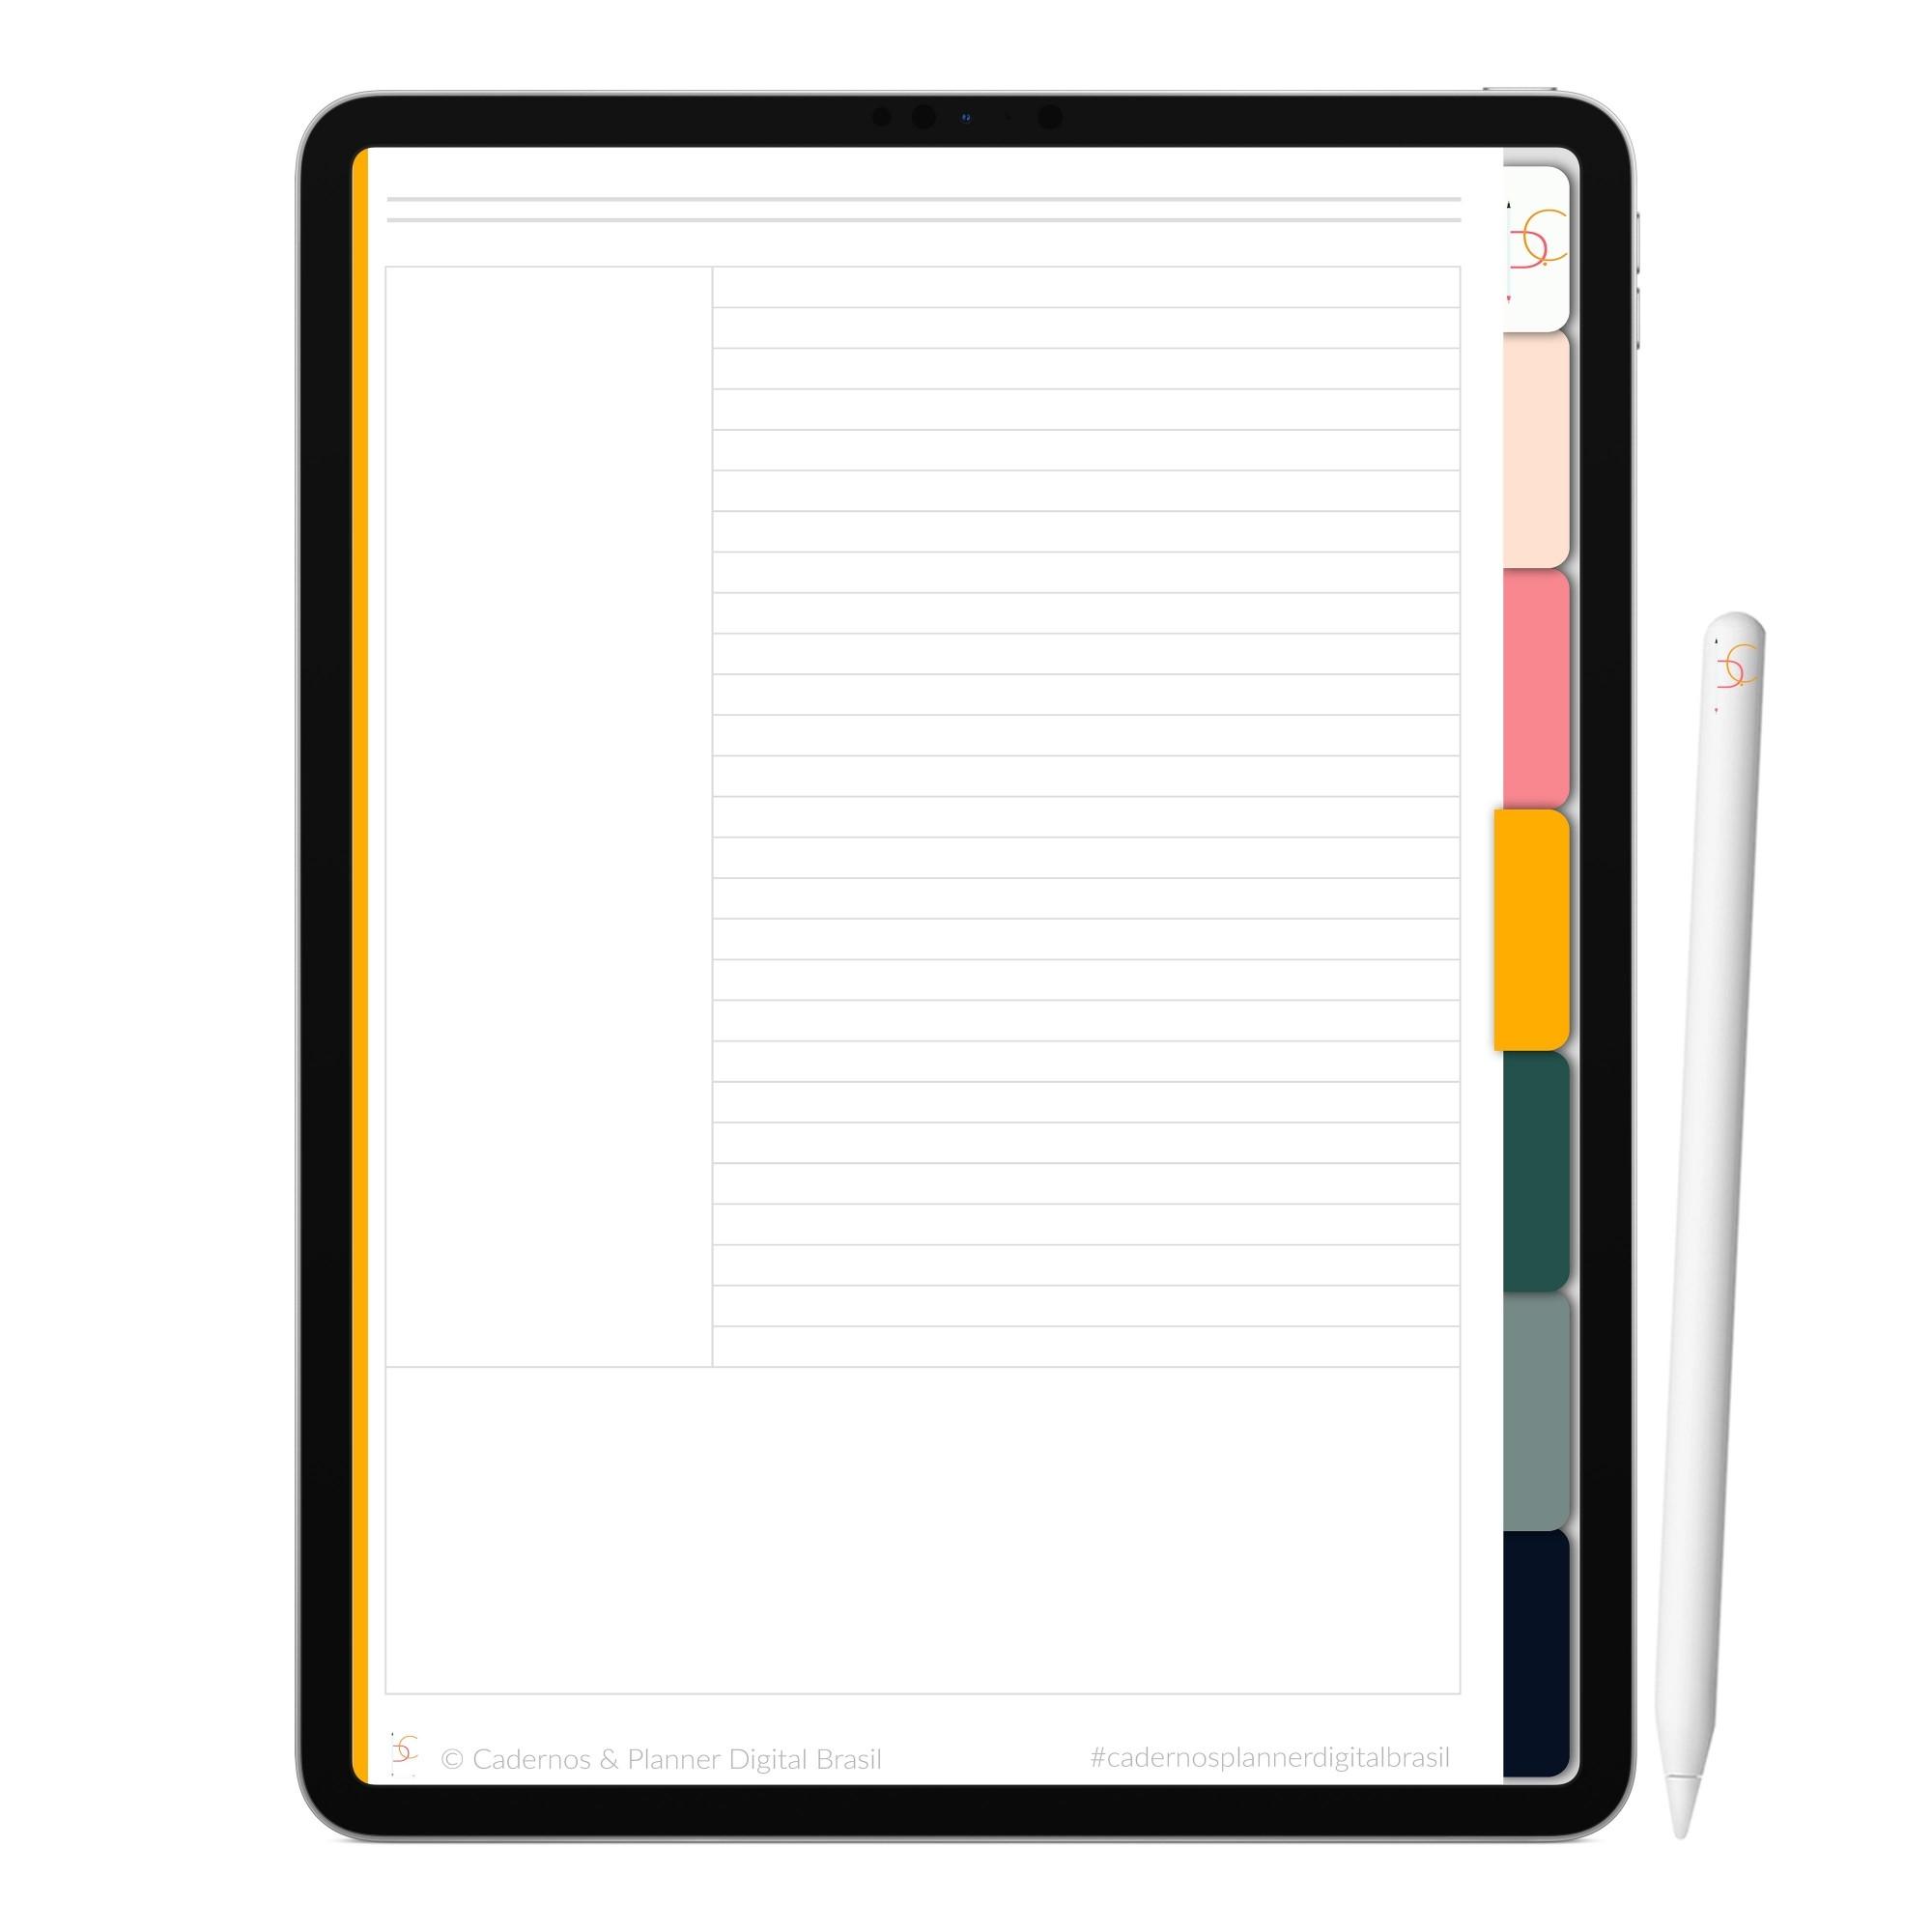 Caderno Digital Love Pink   Seis Divisórias Interativo  iPad Tablet   Download Instantâneo